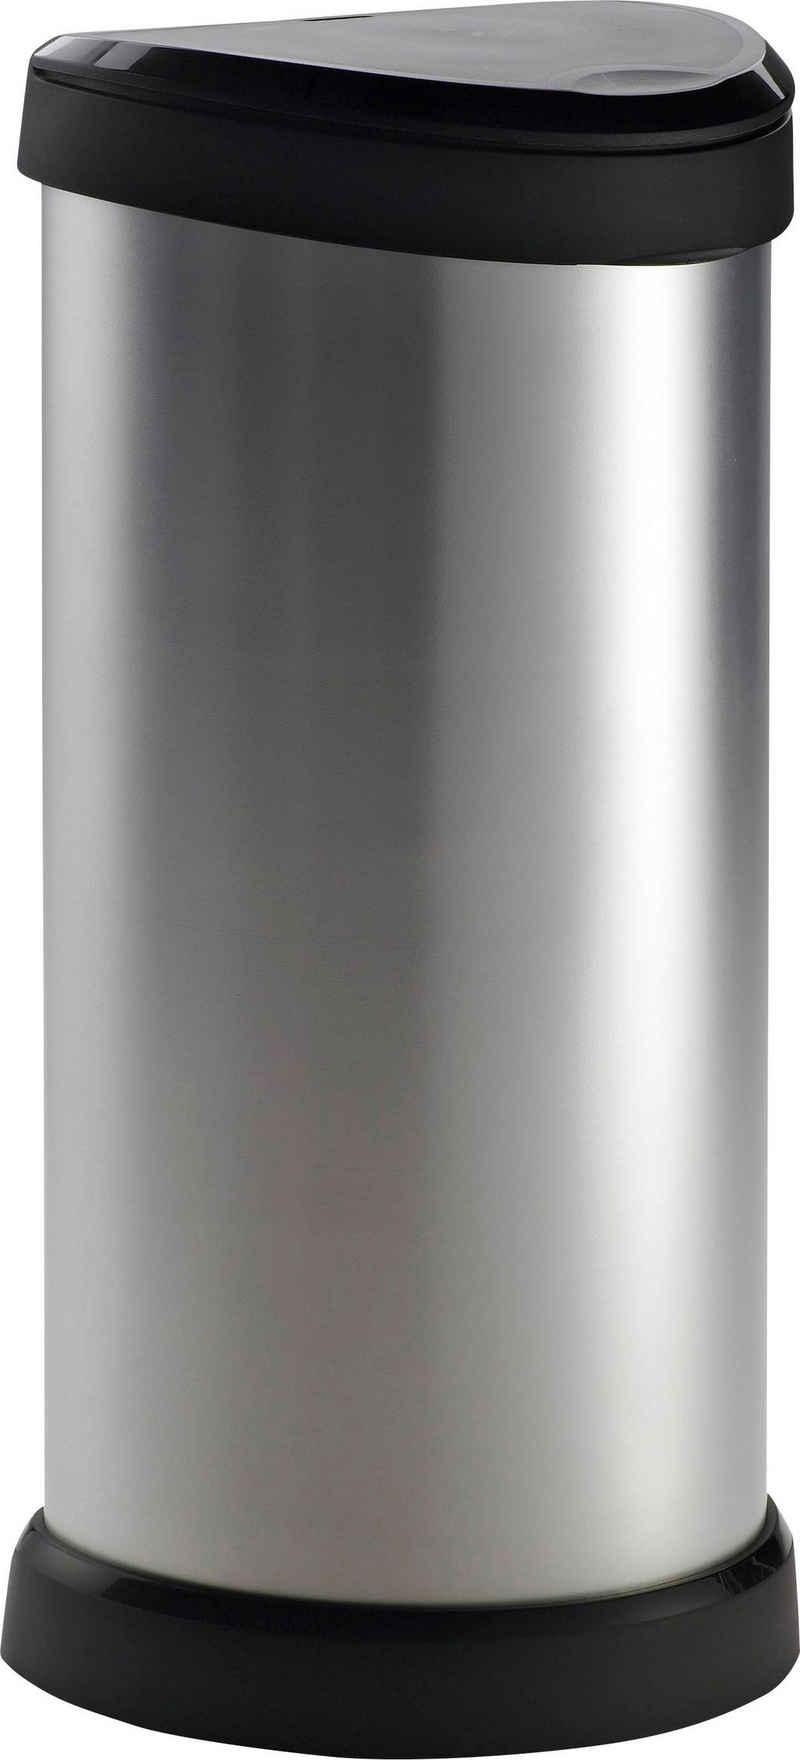 Curver Mülleimer »Decobin«, 40 Liter